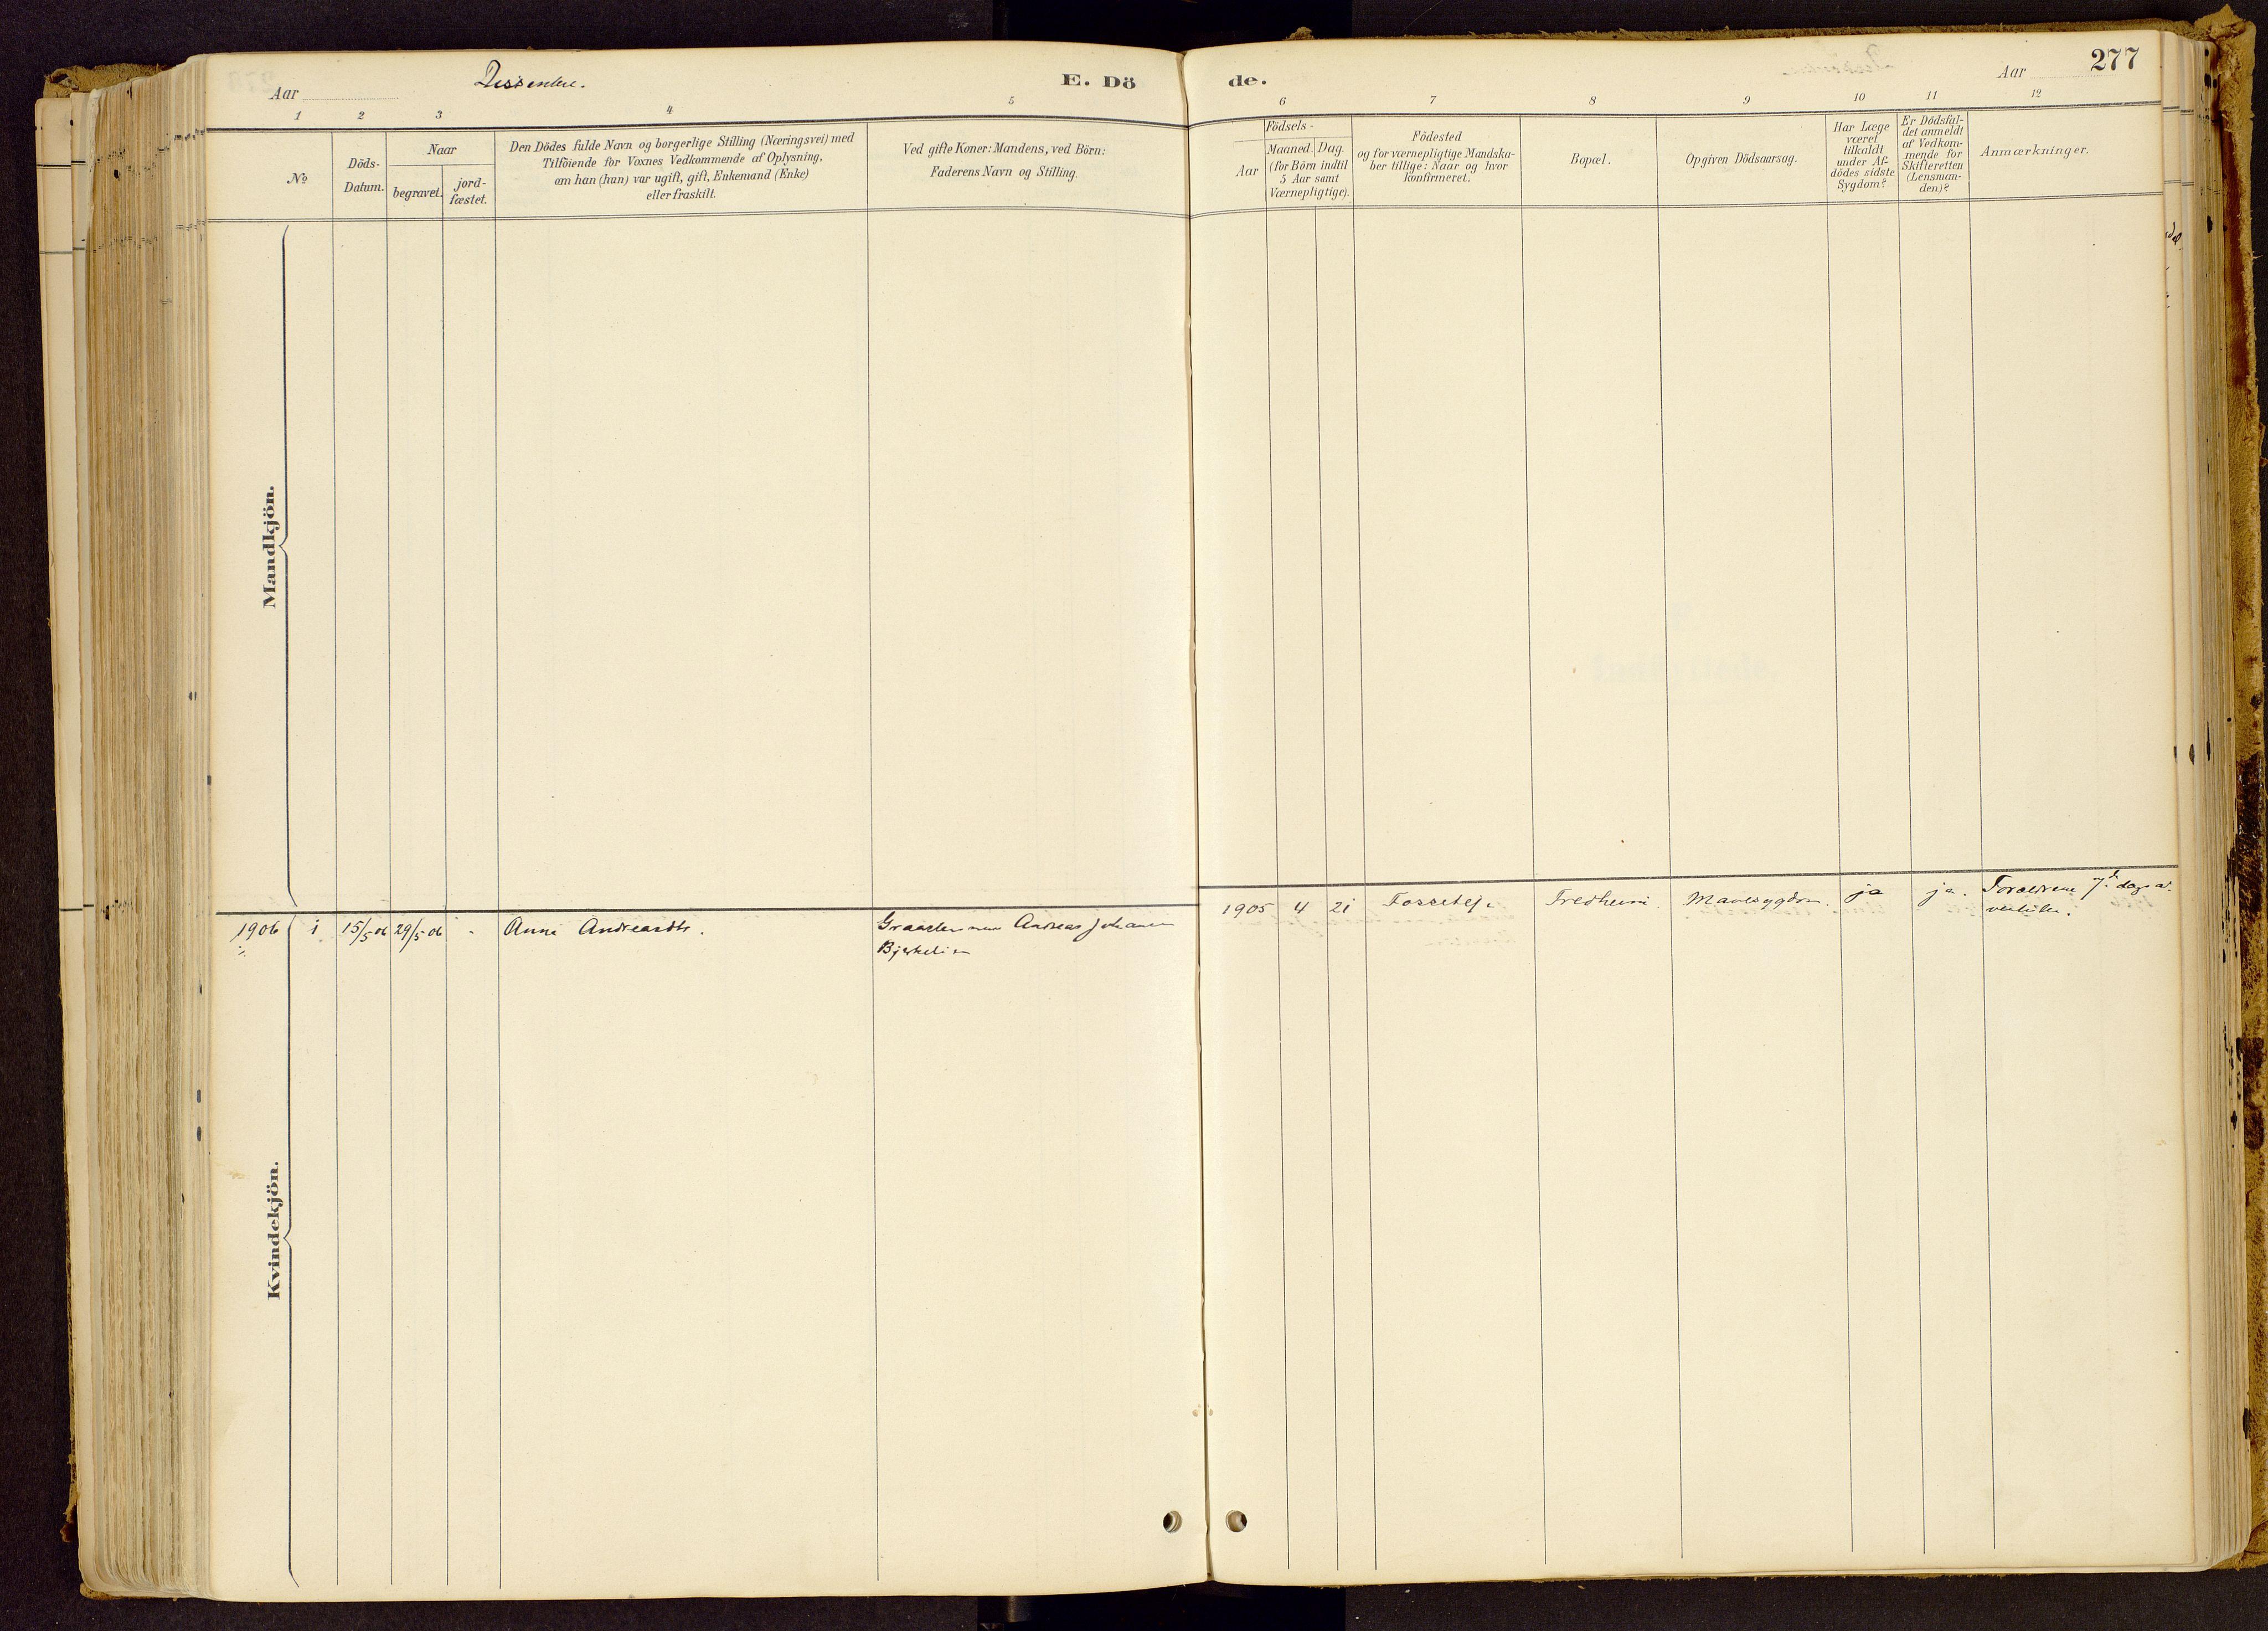 SAH, Vestre Gausdal prestekontor, Ministerialbok nr. 1, 1887-1914, s. 277